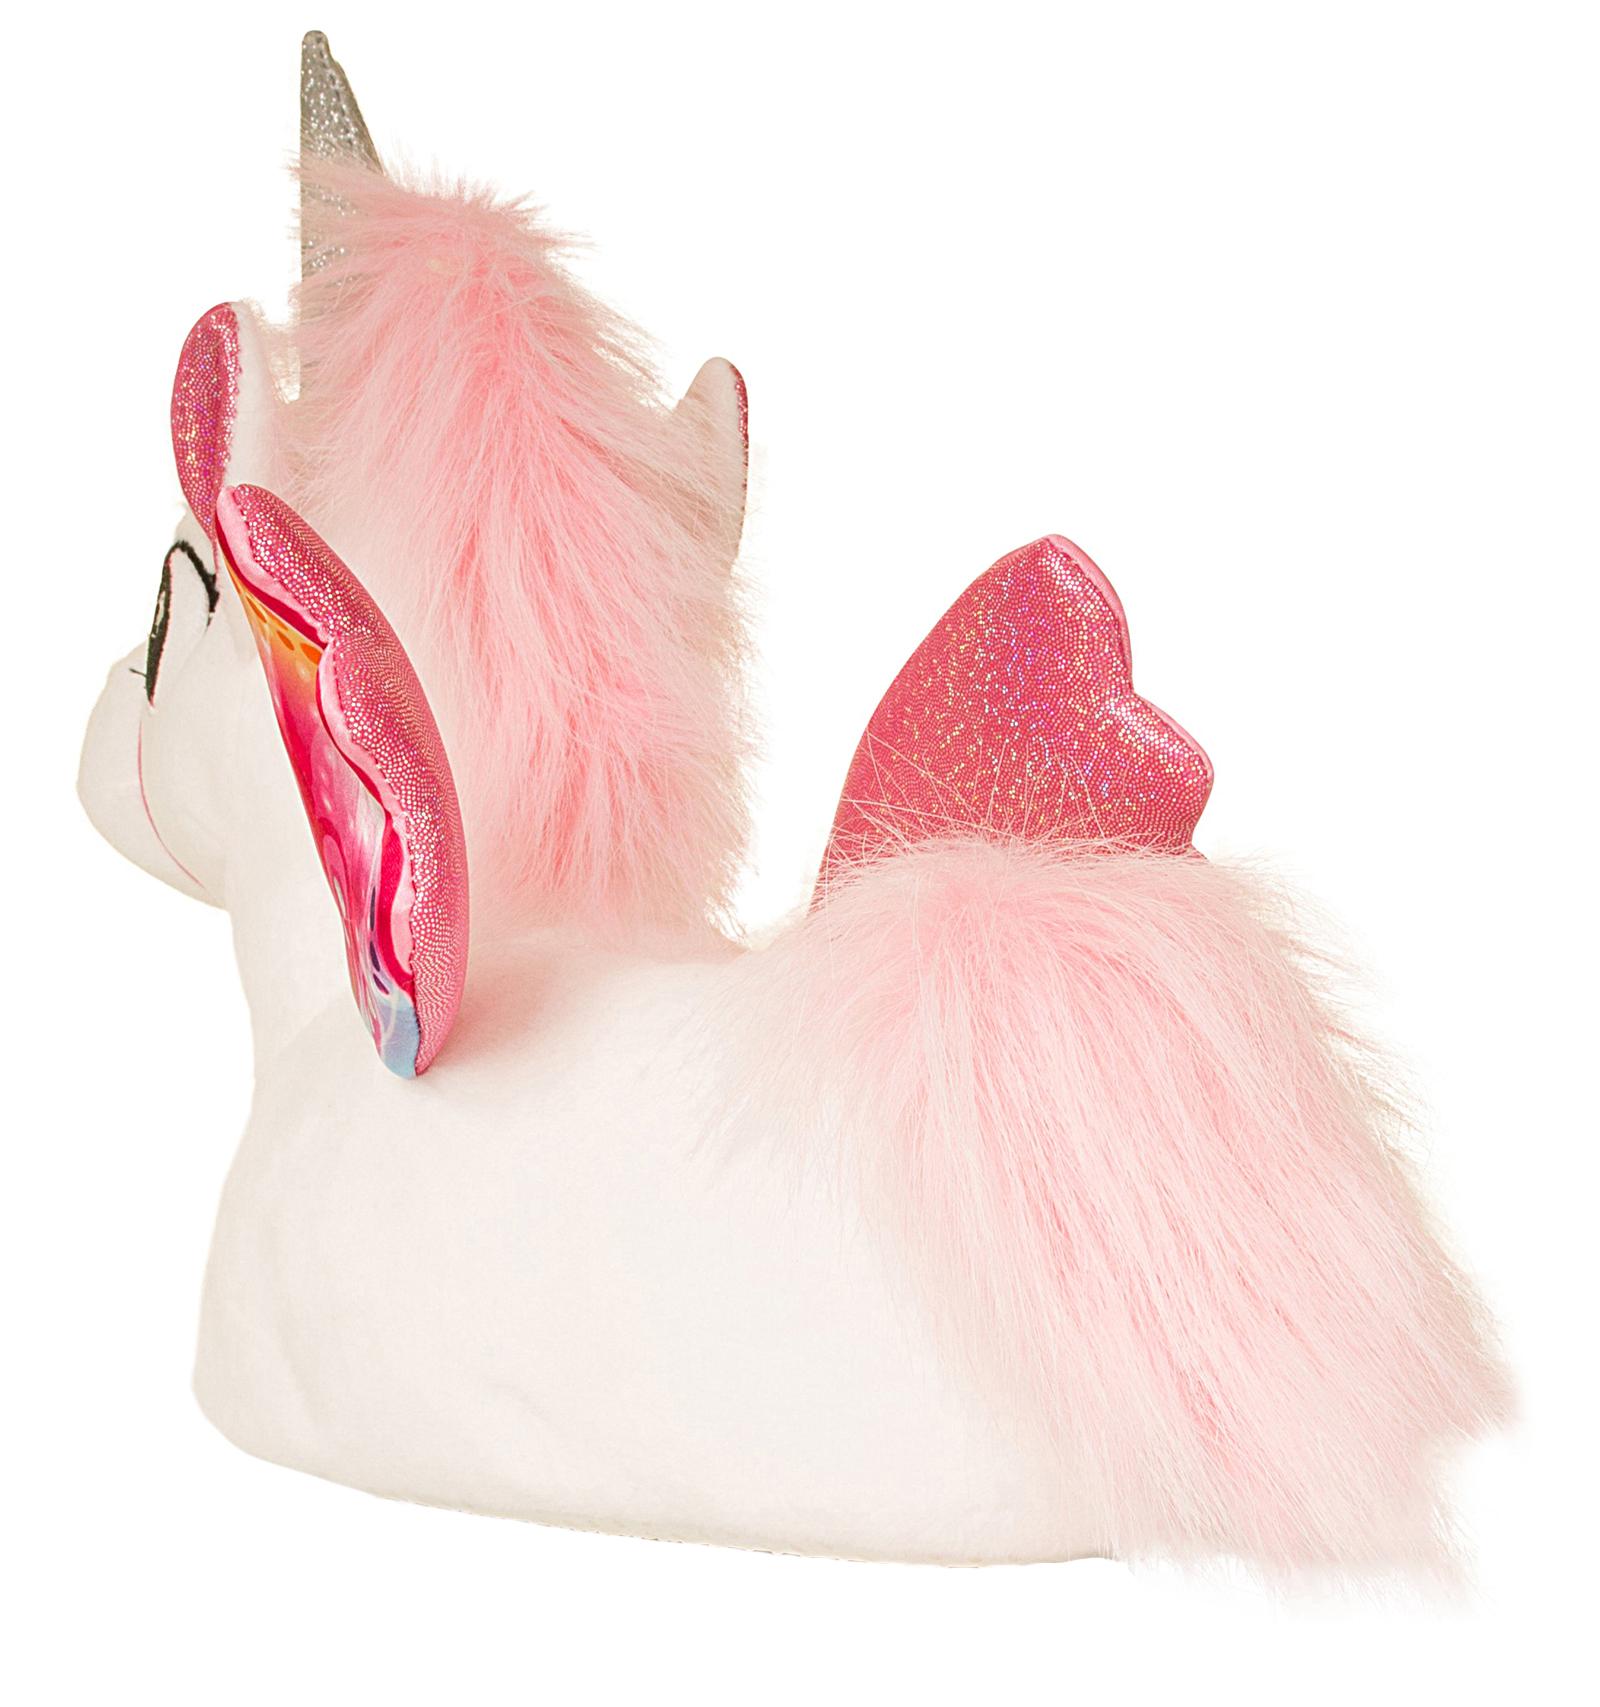 bea6f39efea8 Womens Girls Novelty 3D Character Plush Unicorn Slippers Ladies Gift ...